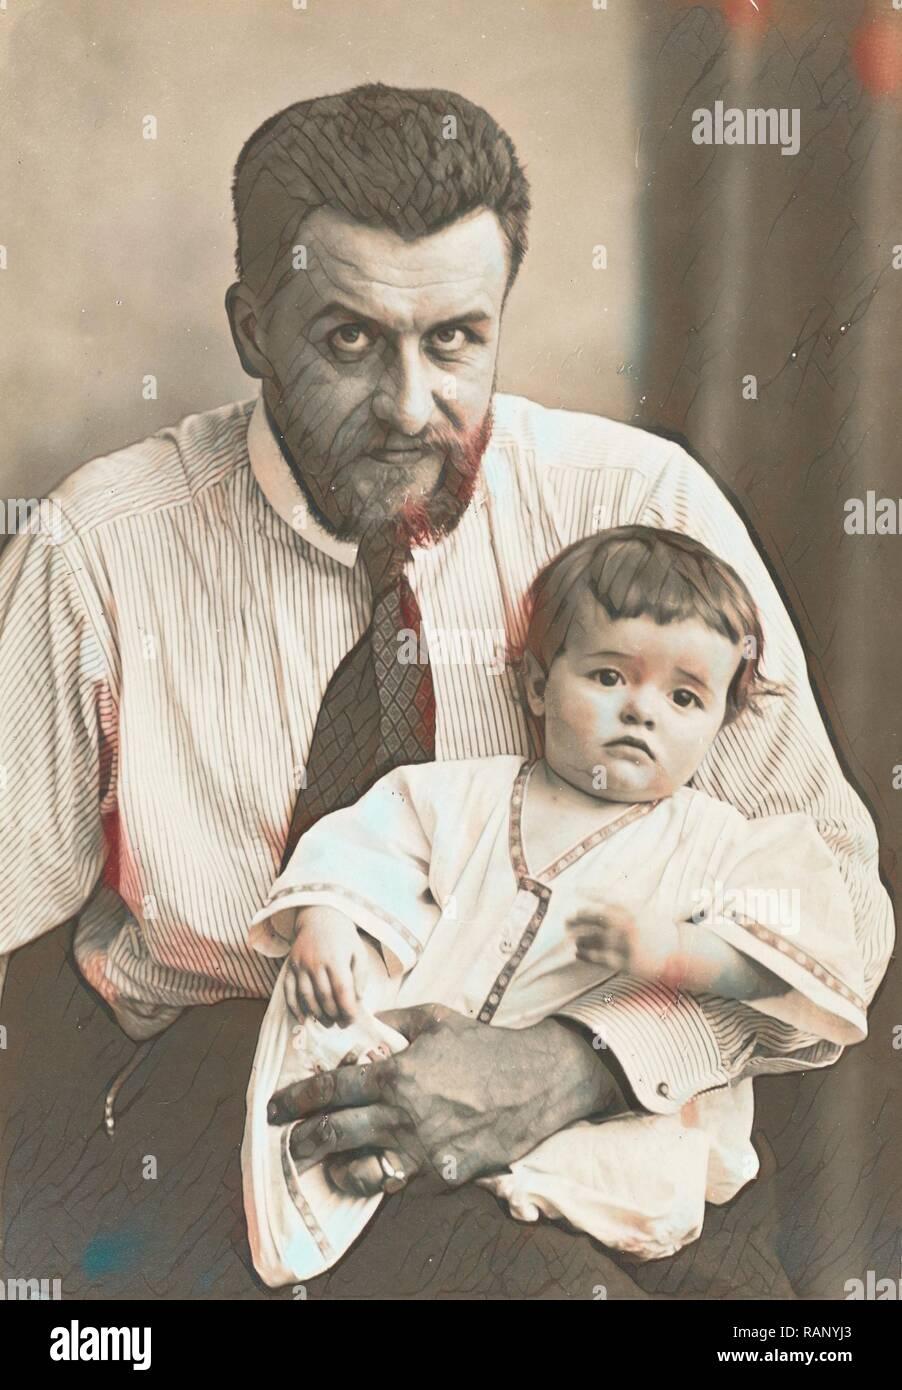 Waldemar Titzenthaler, the photographer, with his daughter Marba, Waldemar Titzenthaler, 1869 - 1937, 1912 reimagined - Stock Image